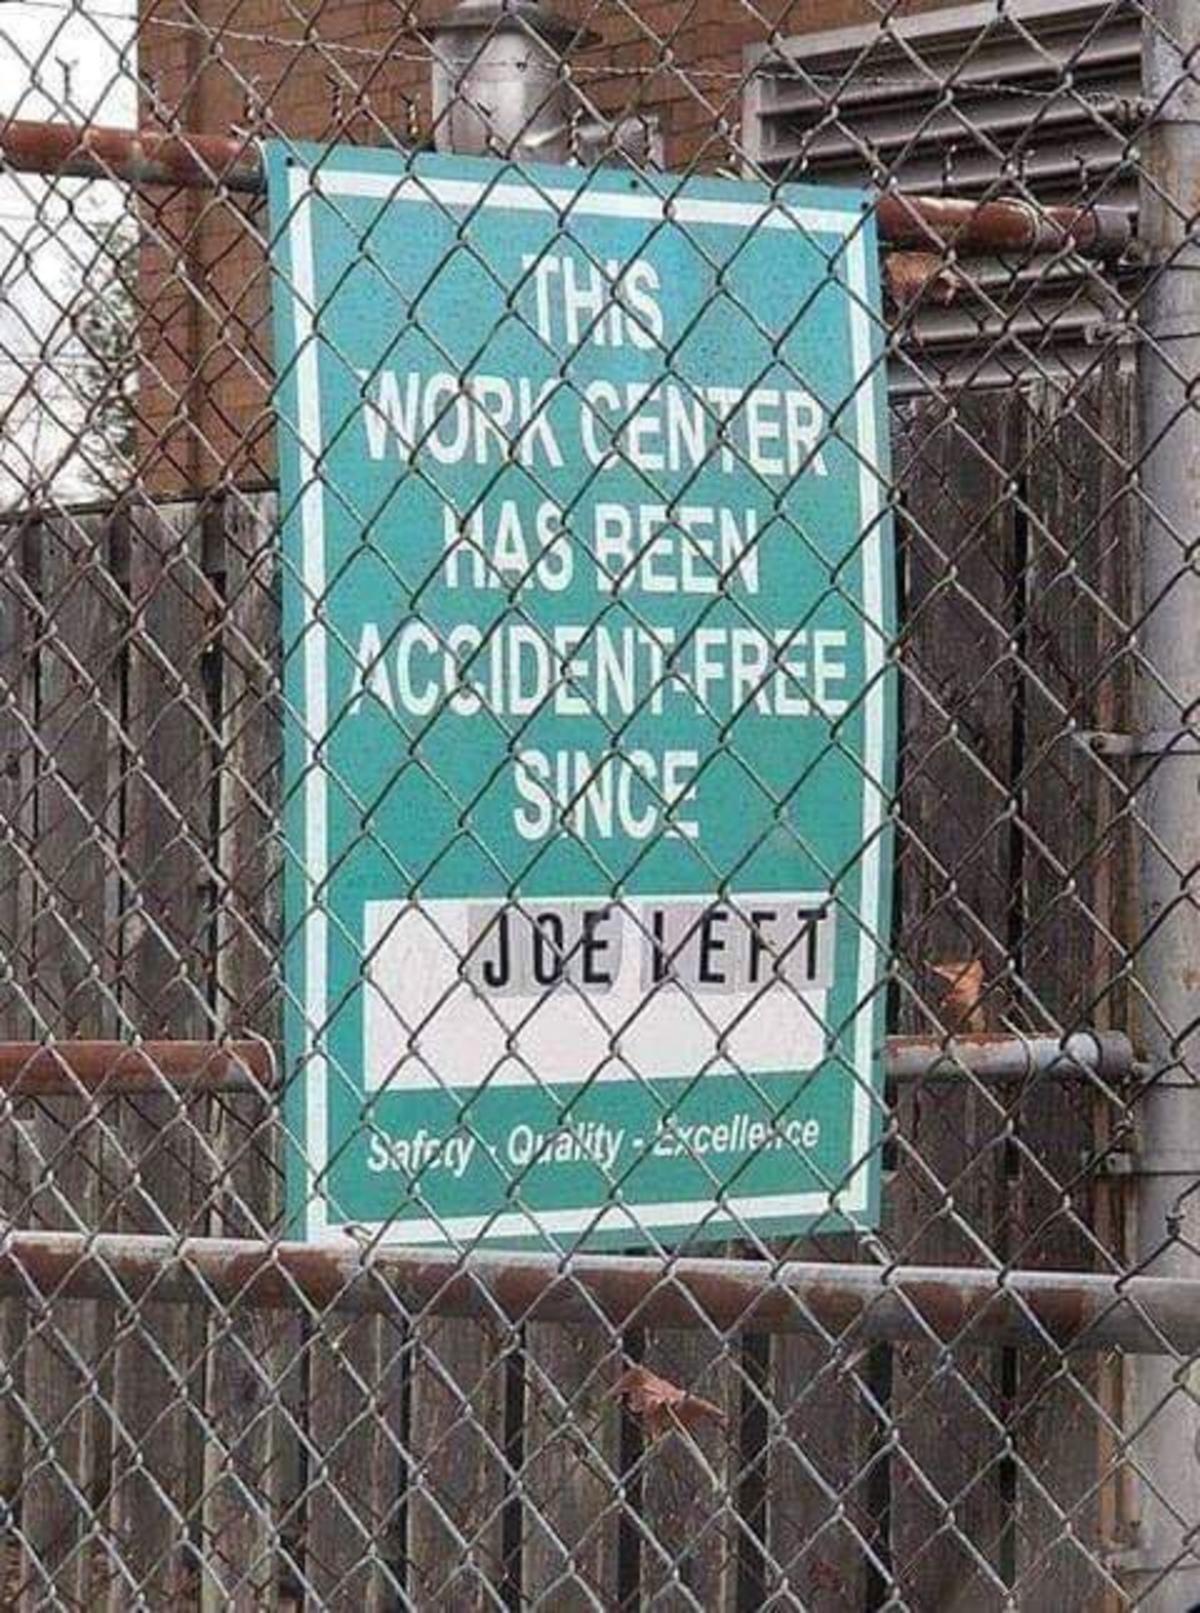 Damn It Joe!. .. who's joe?